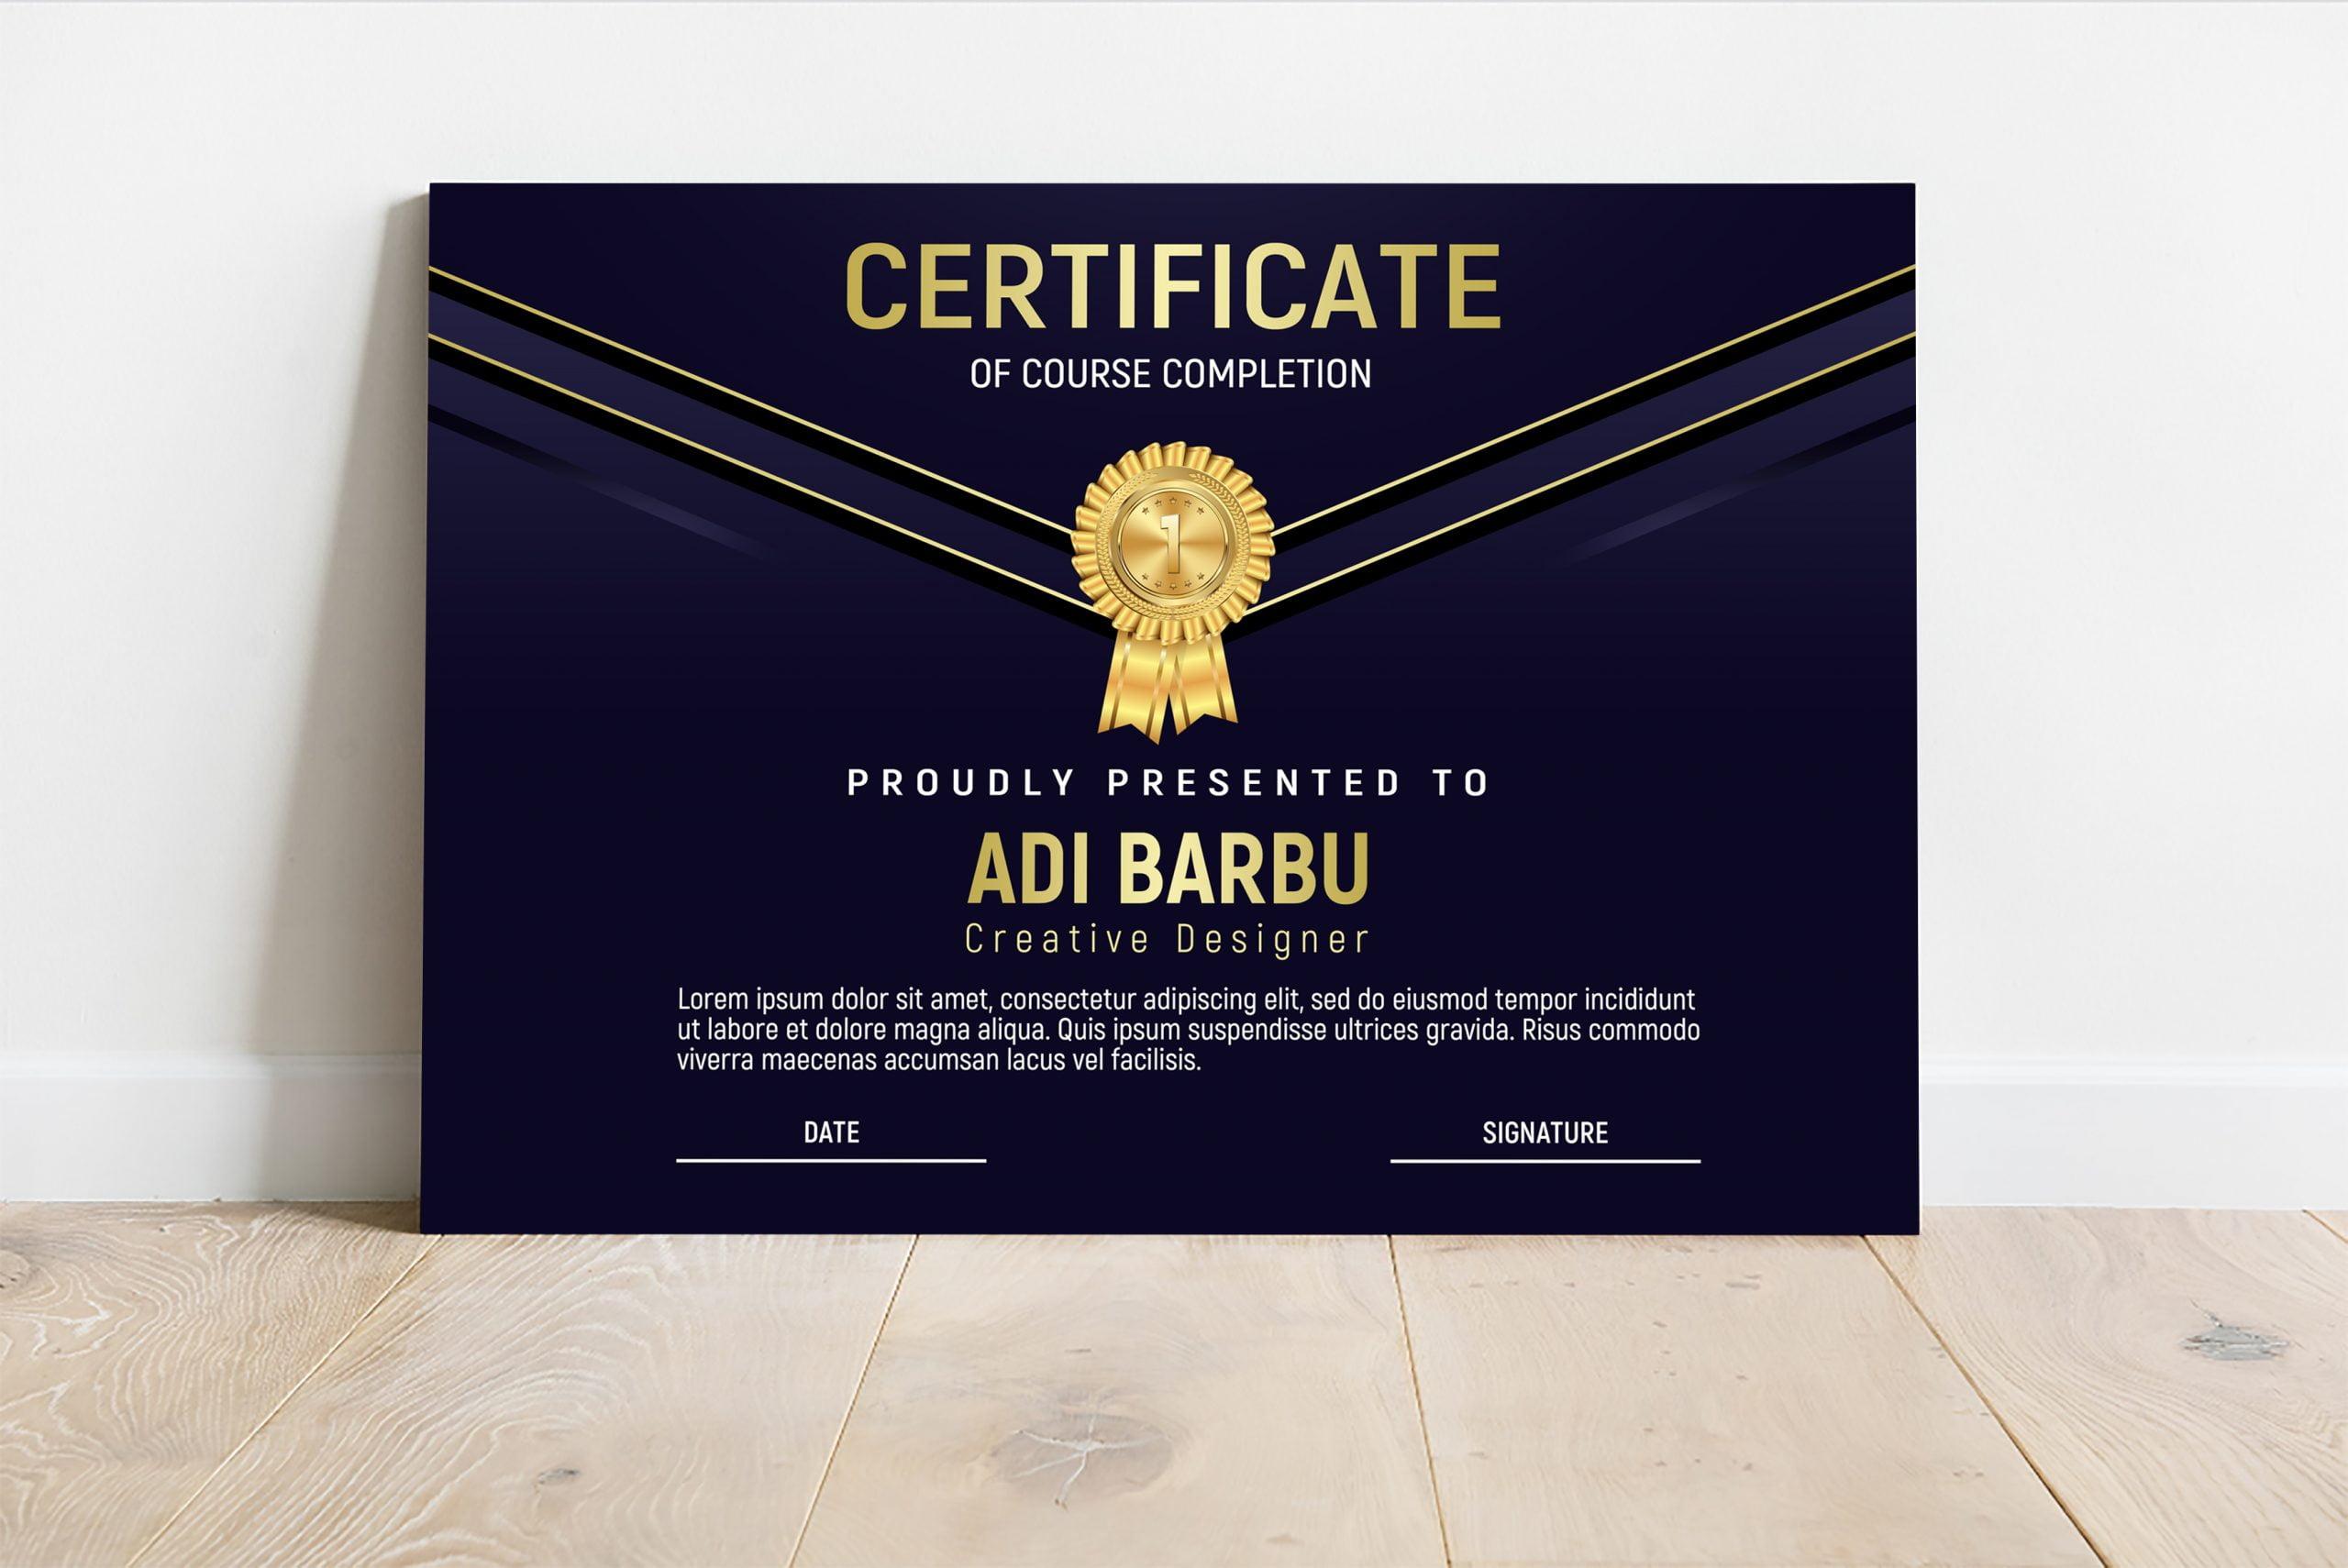 Course Completion Certificate Design Template